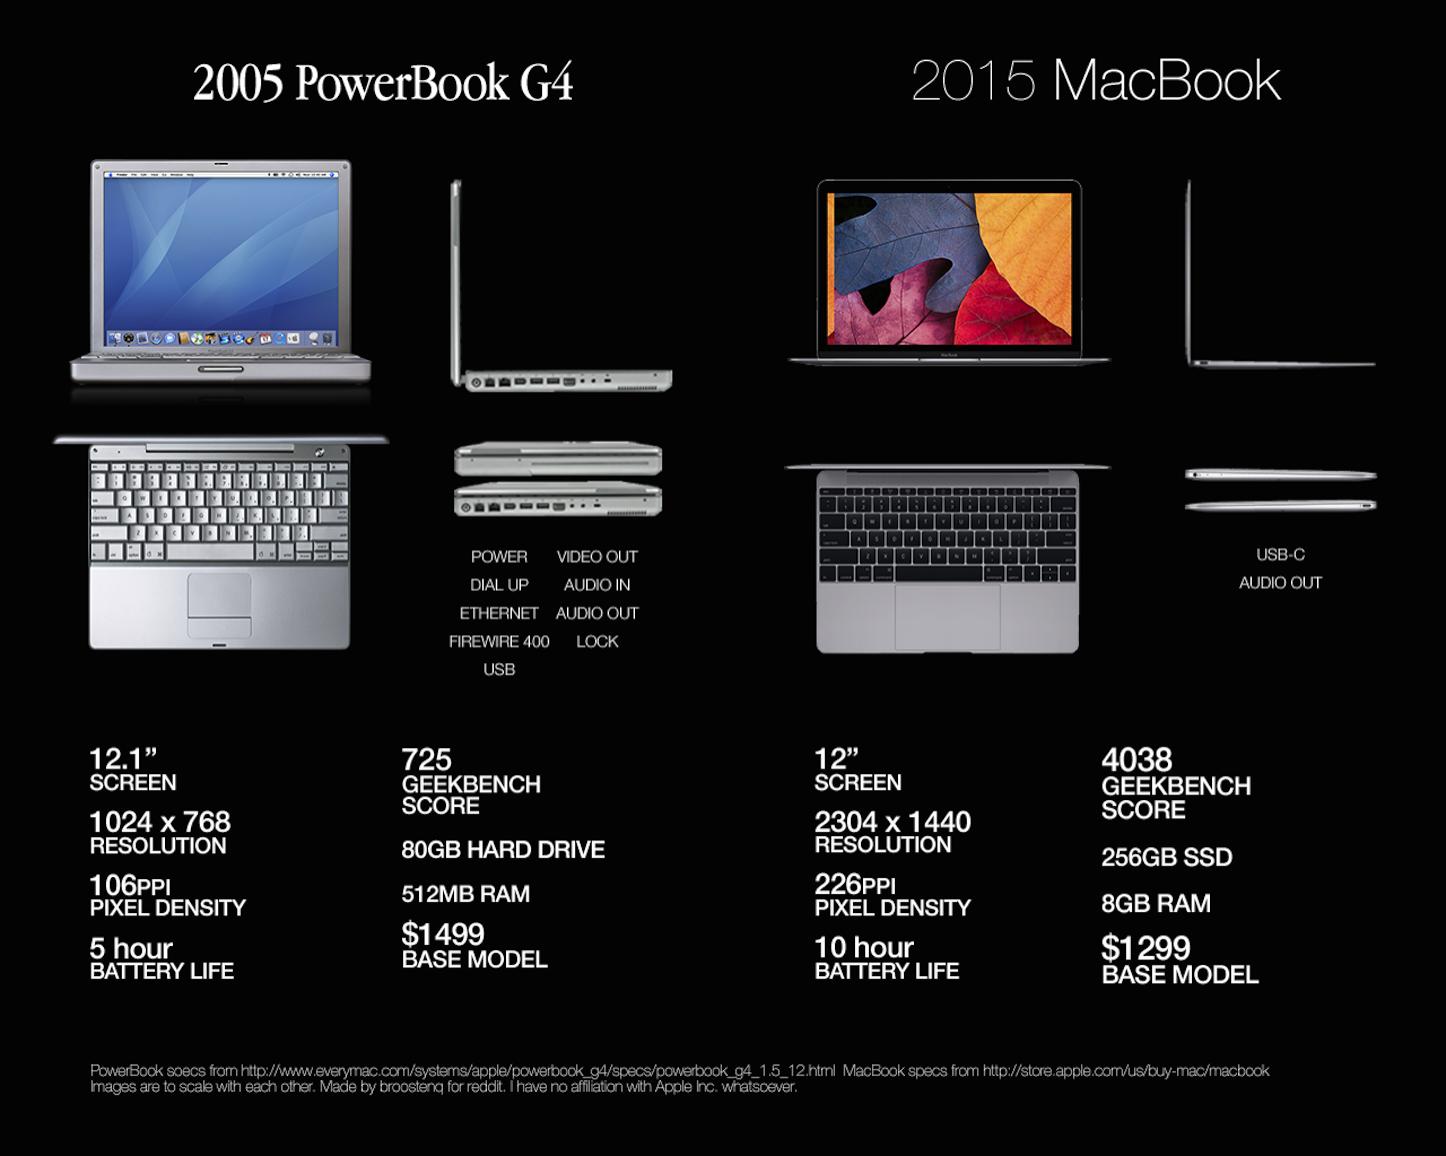 12 inch retina macbook vs 12 inch powerbook